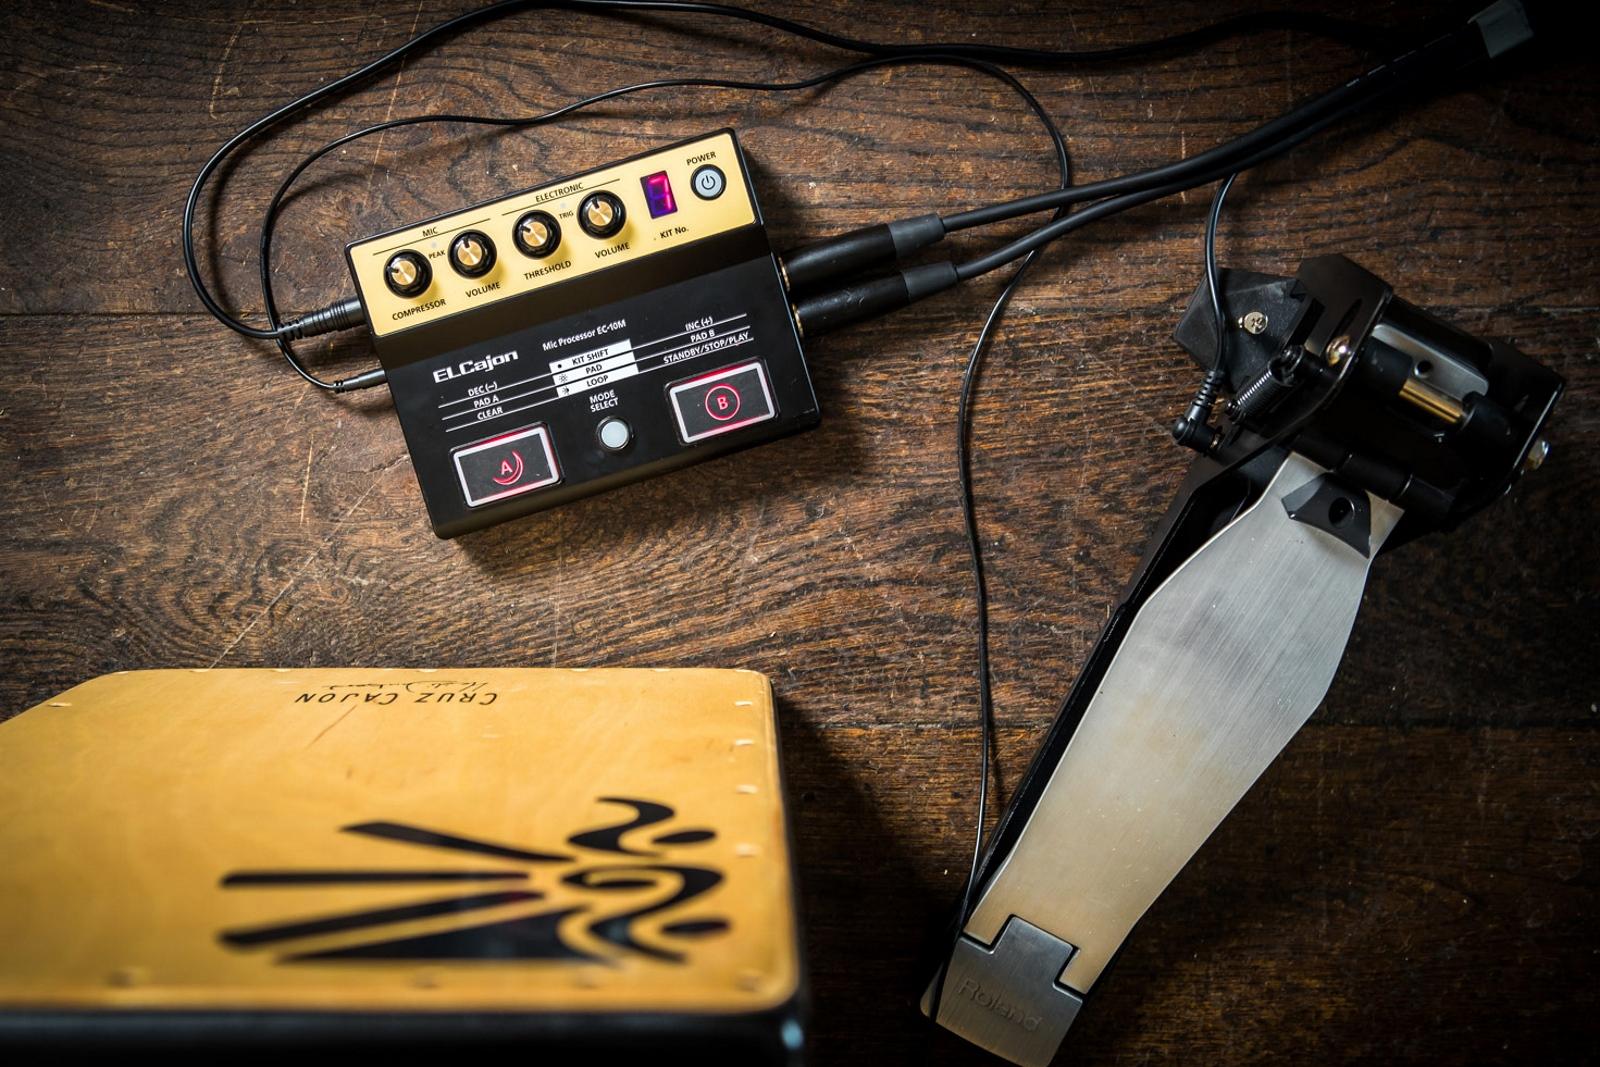 Roland Ec 10m Elcajon Mic Processor Wiring Piezo And Mag Ic Pick Up On A Volume Pot For Guitar 10melcajon